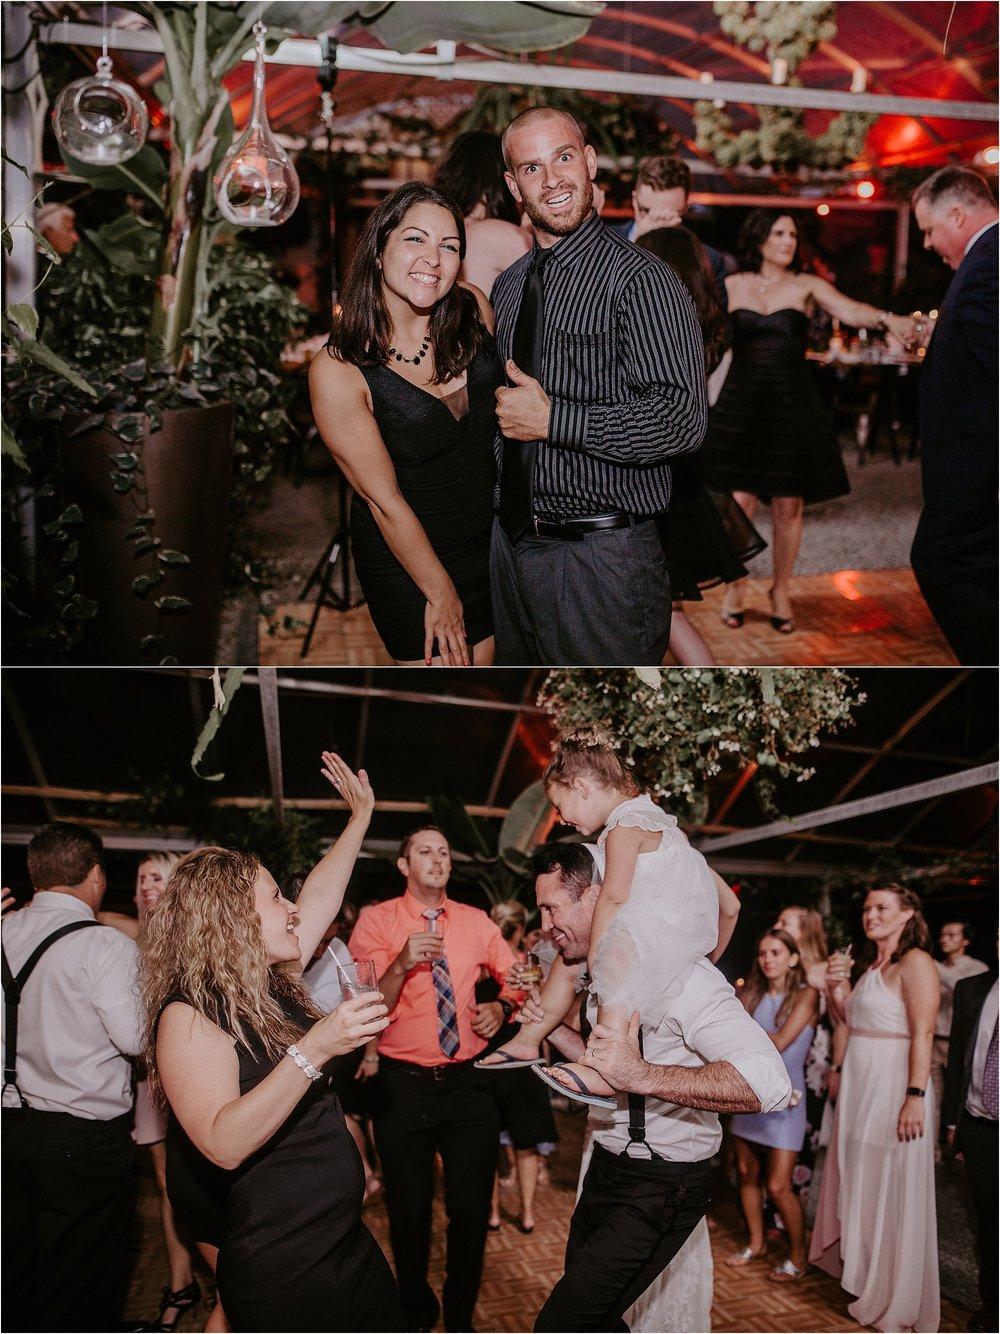 Sarah_Brookhart_Hortulus_Farm_Garden_and_Nursey_Wedding_Photographer_0079.jpg